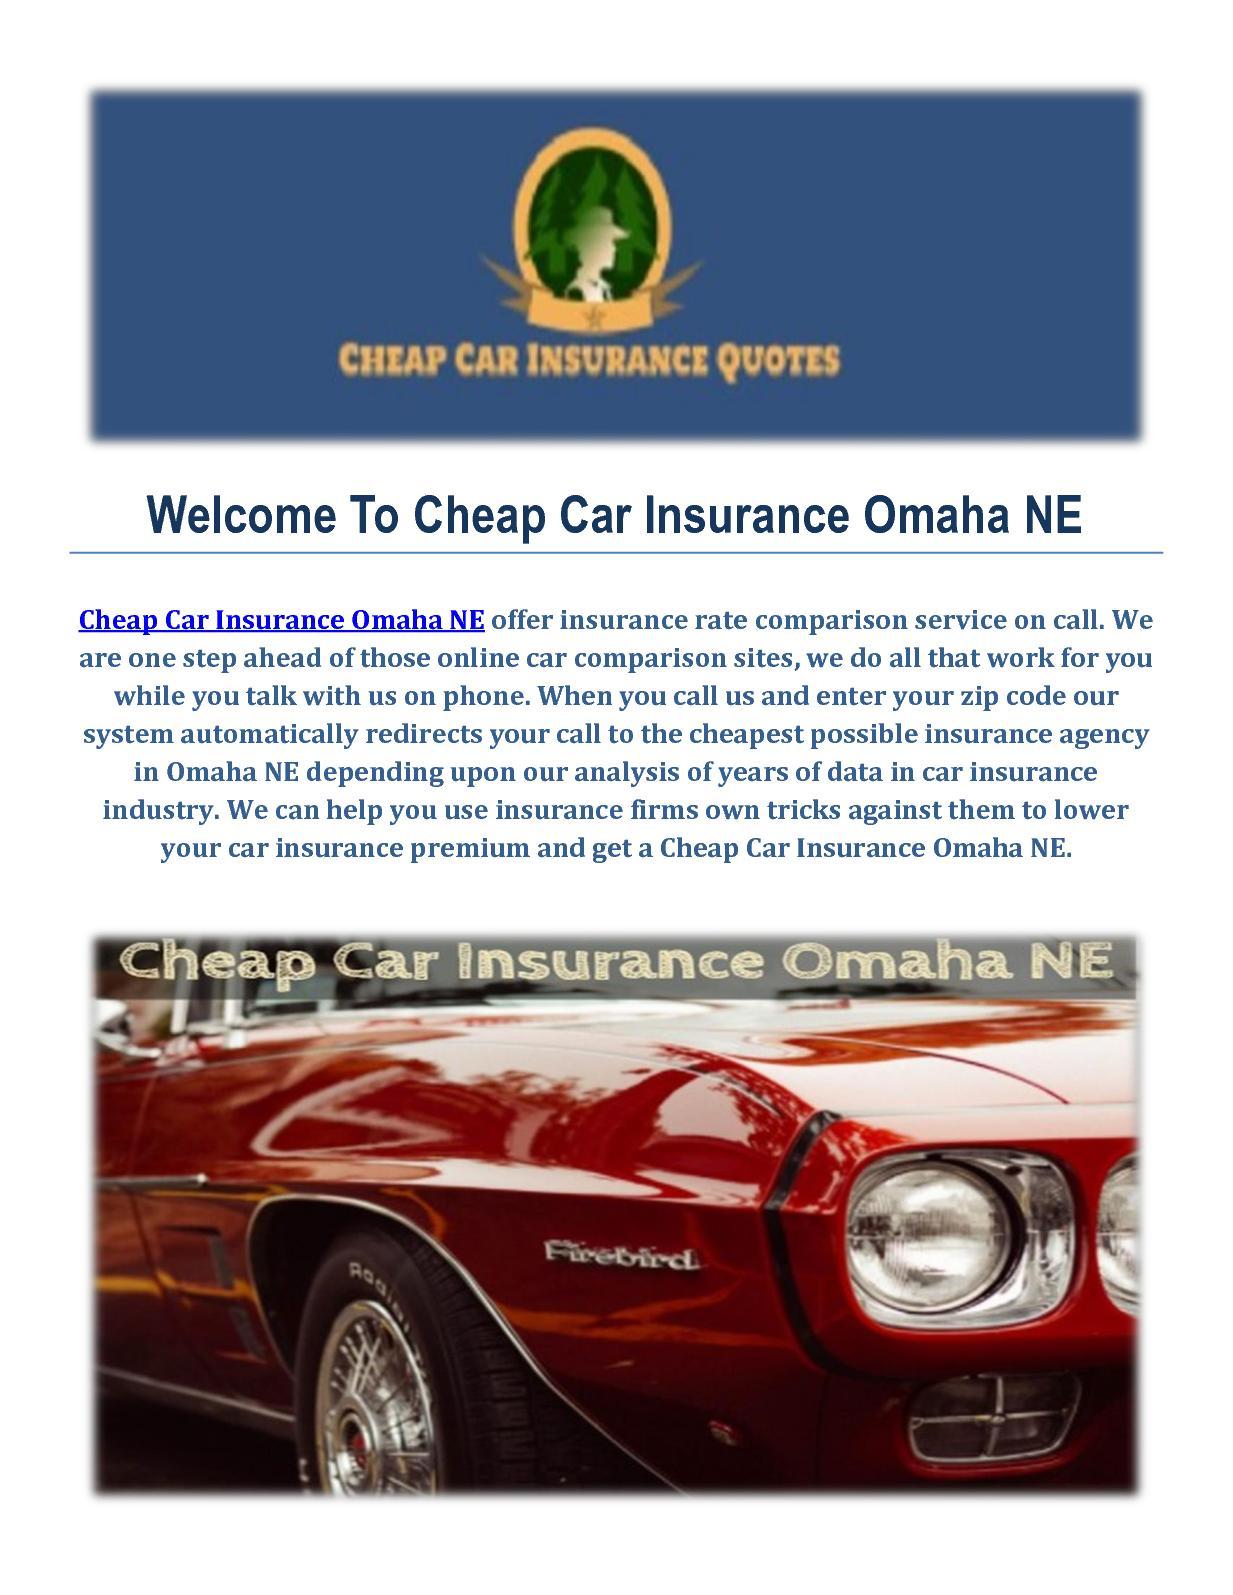 Calameo Cheap Car Insurance Agency In Omaha